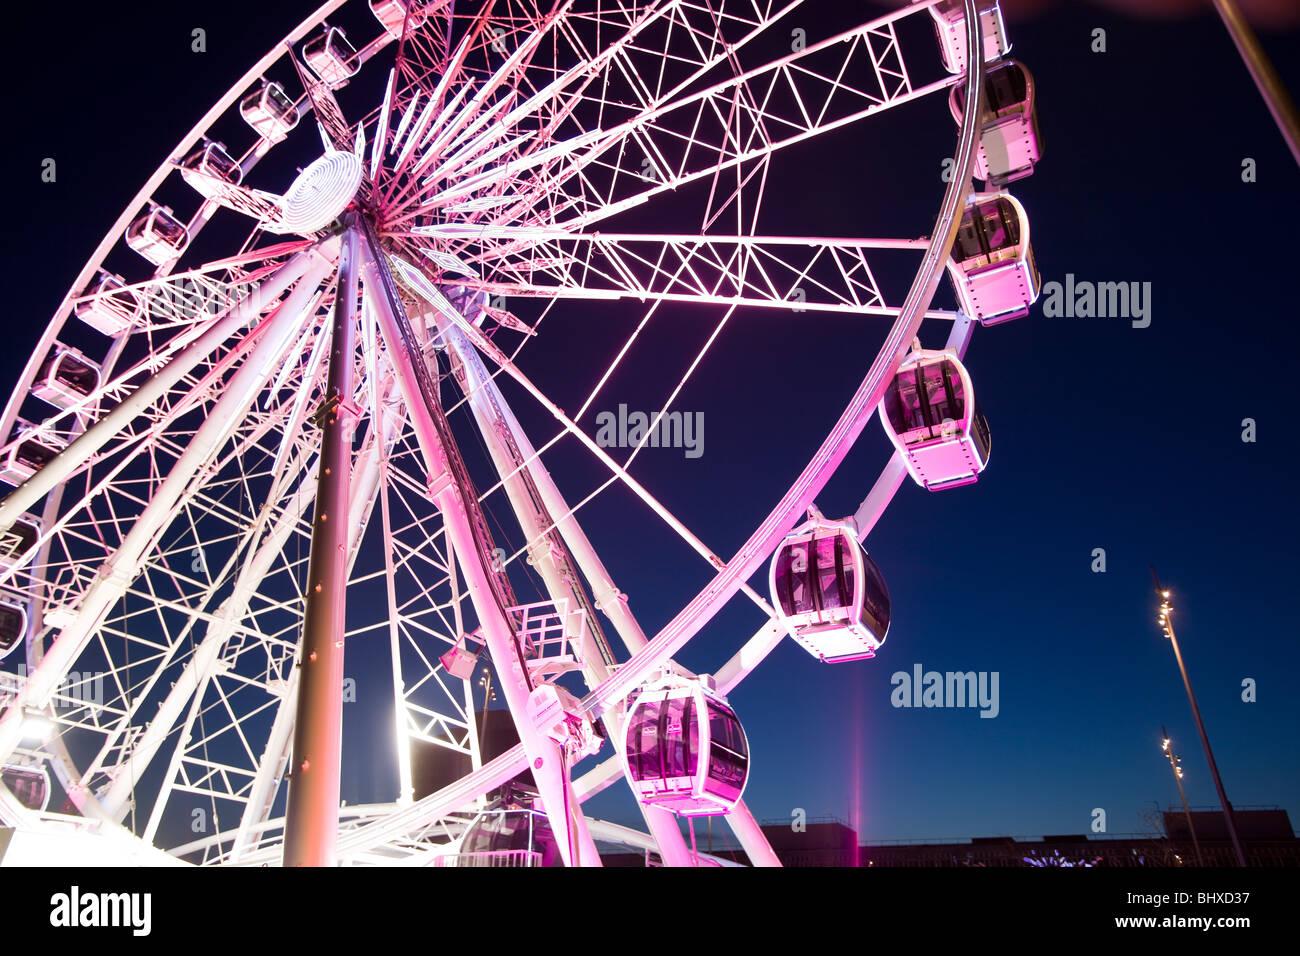 Middlesbrough wheel - Stock Image